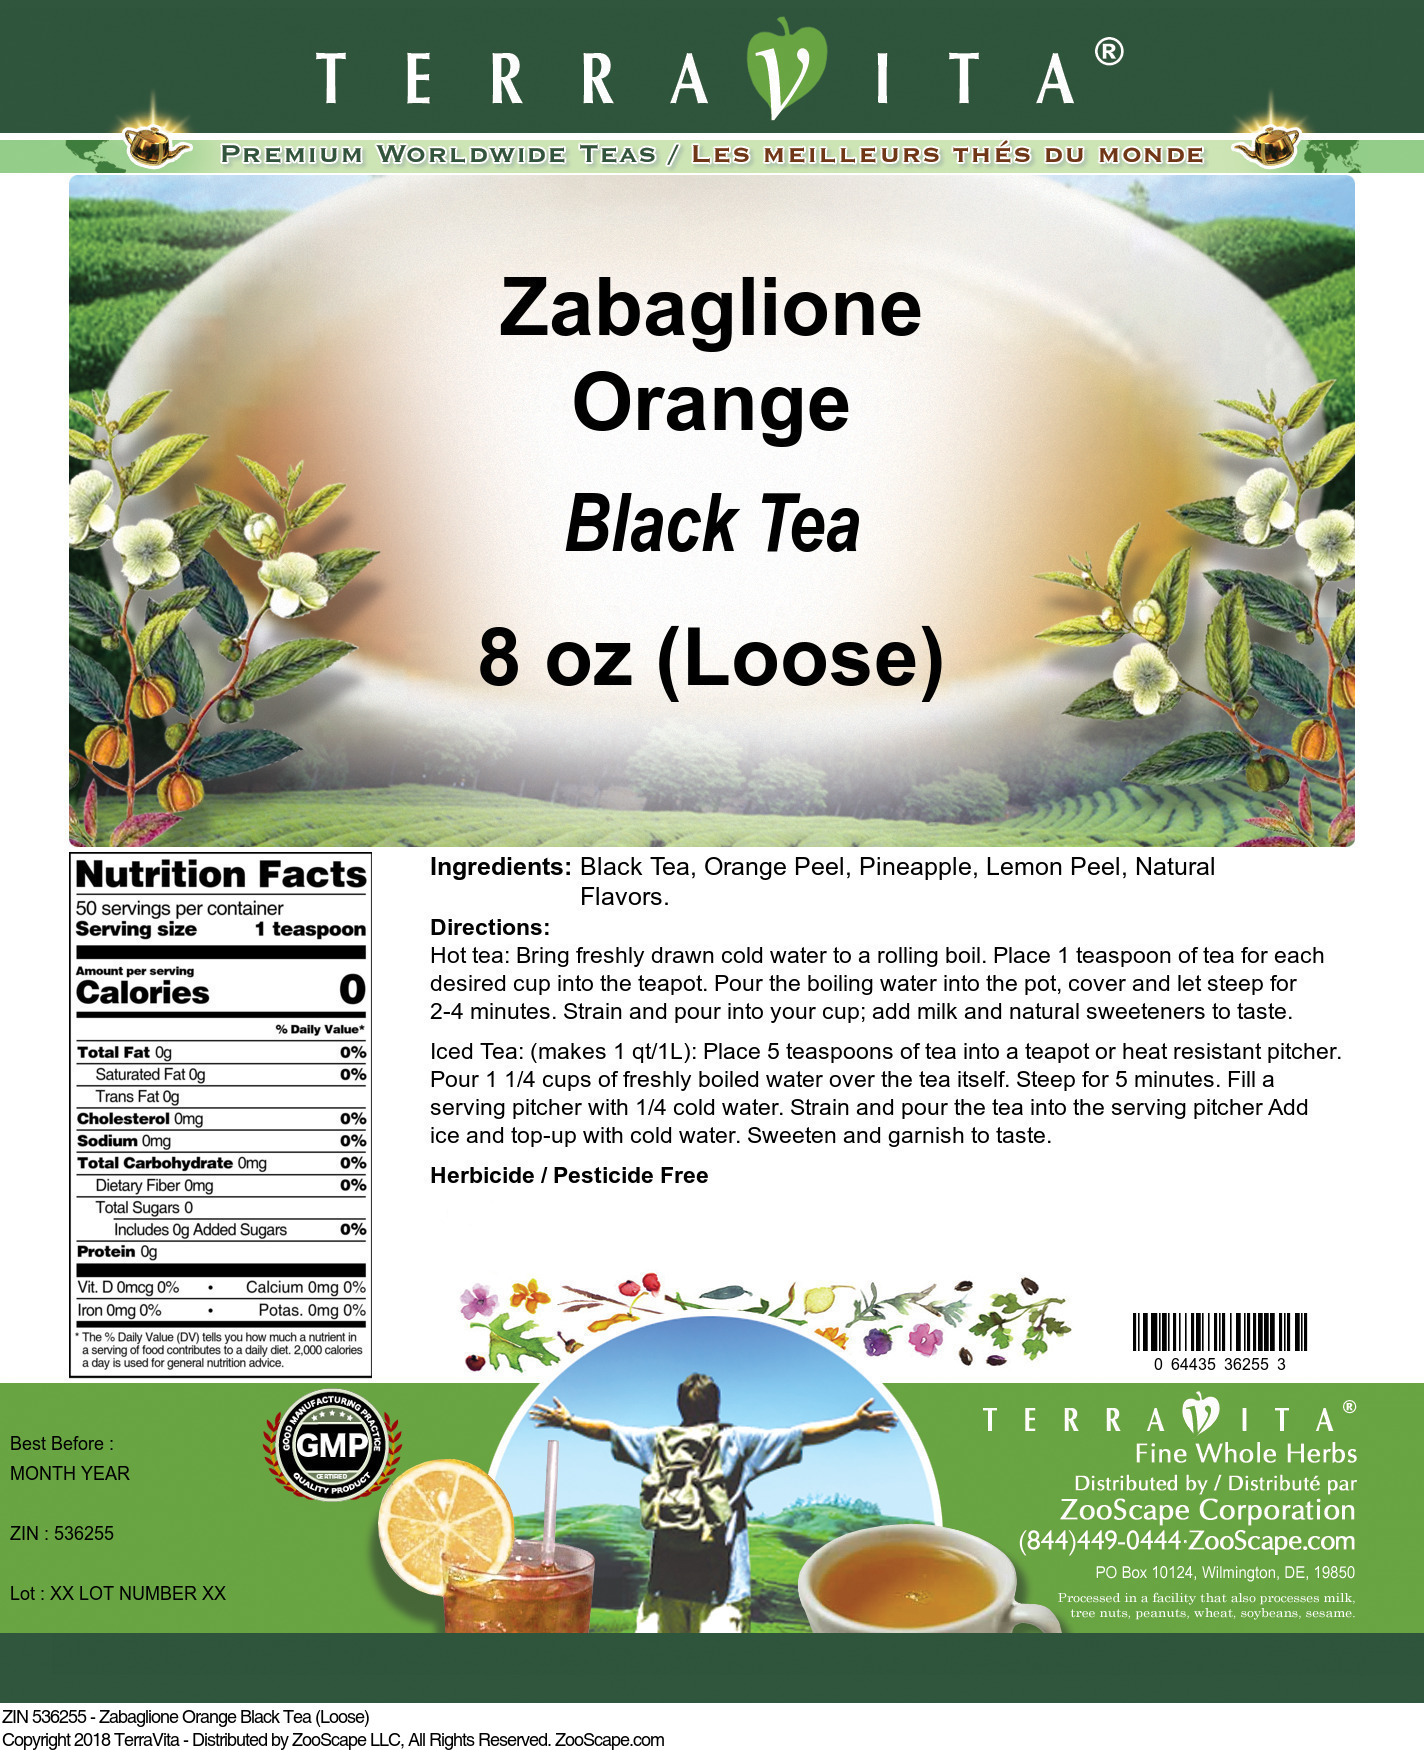 Zabaglione Orange Black Tea (Loose)